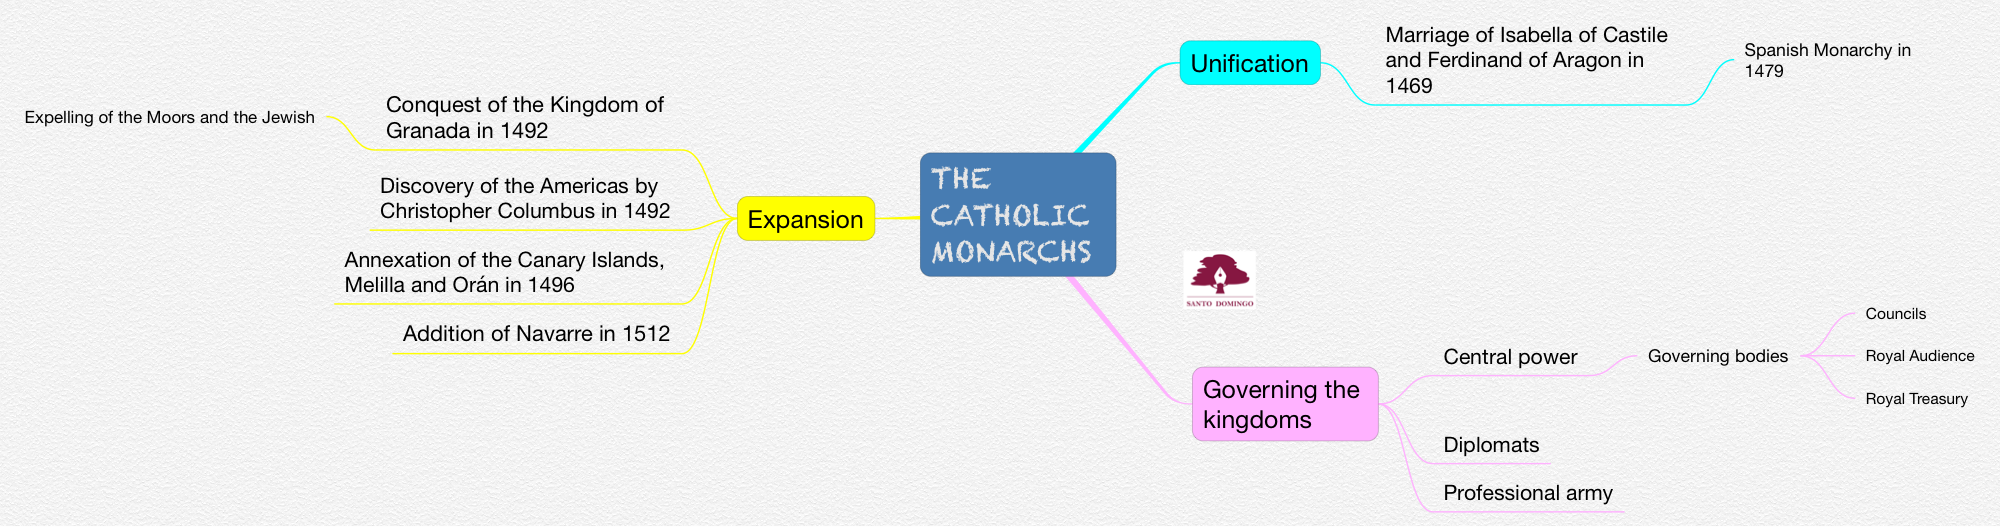 SS_THE CATHOLIC MONARCHS_5